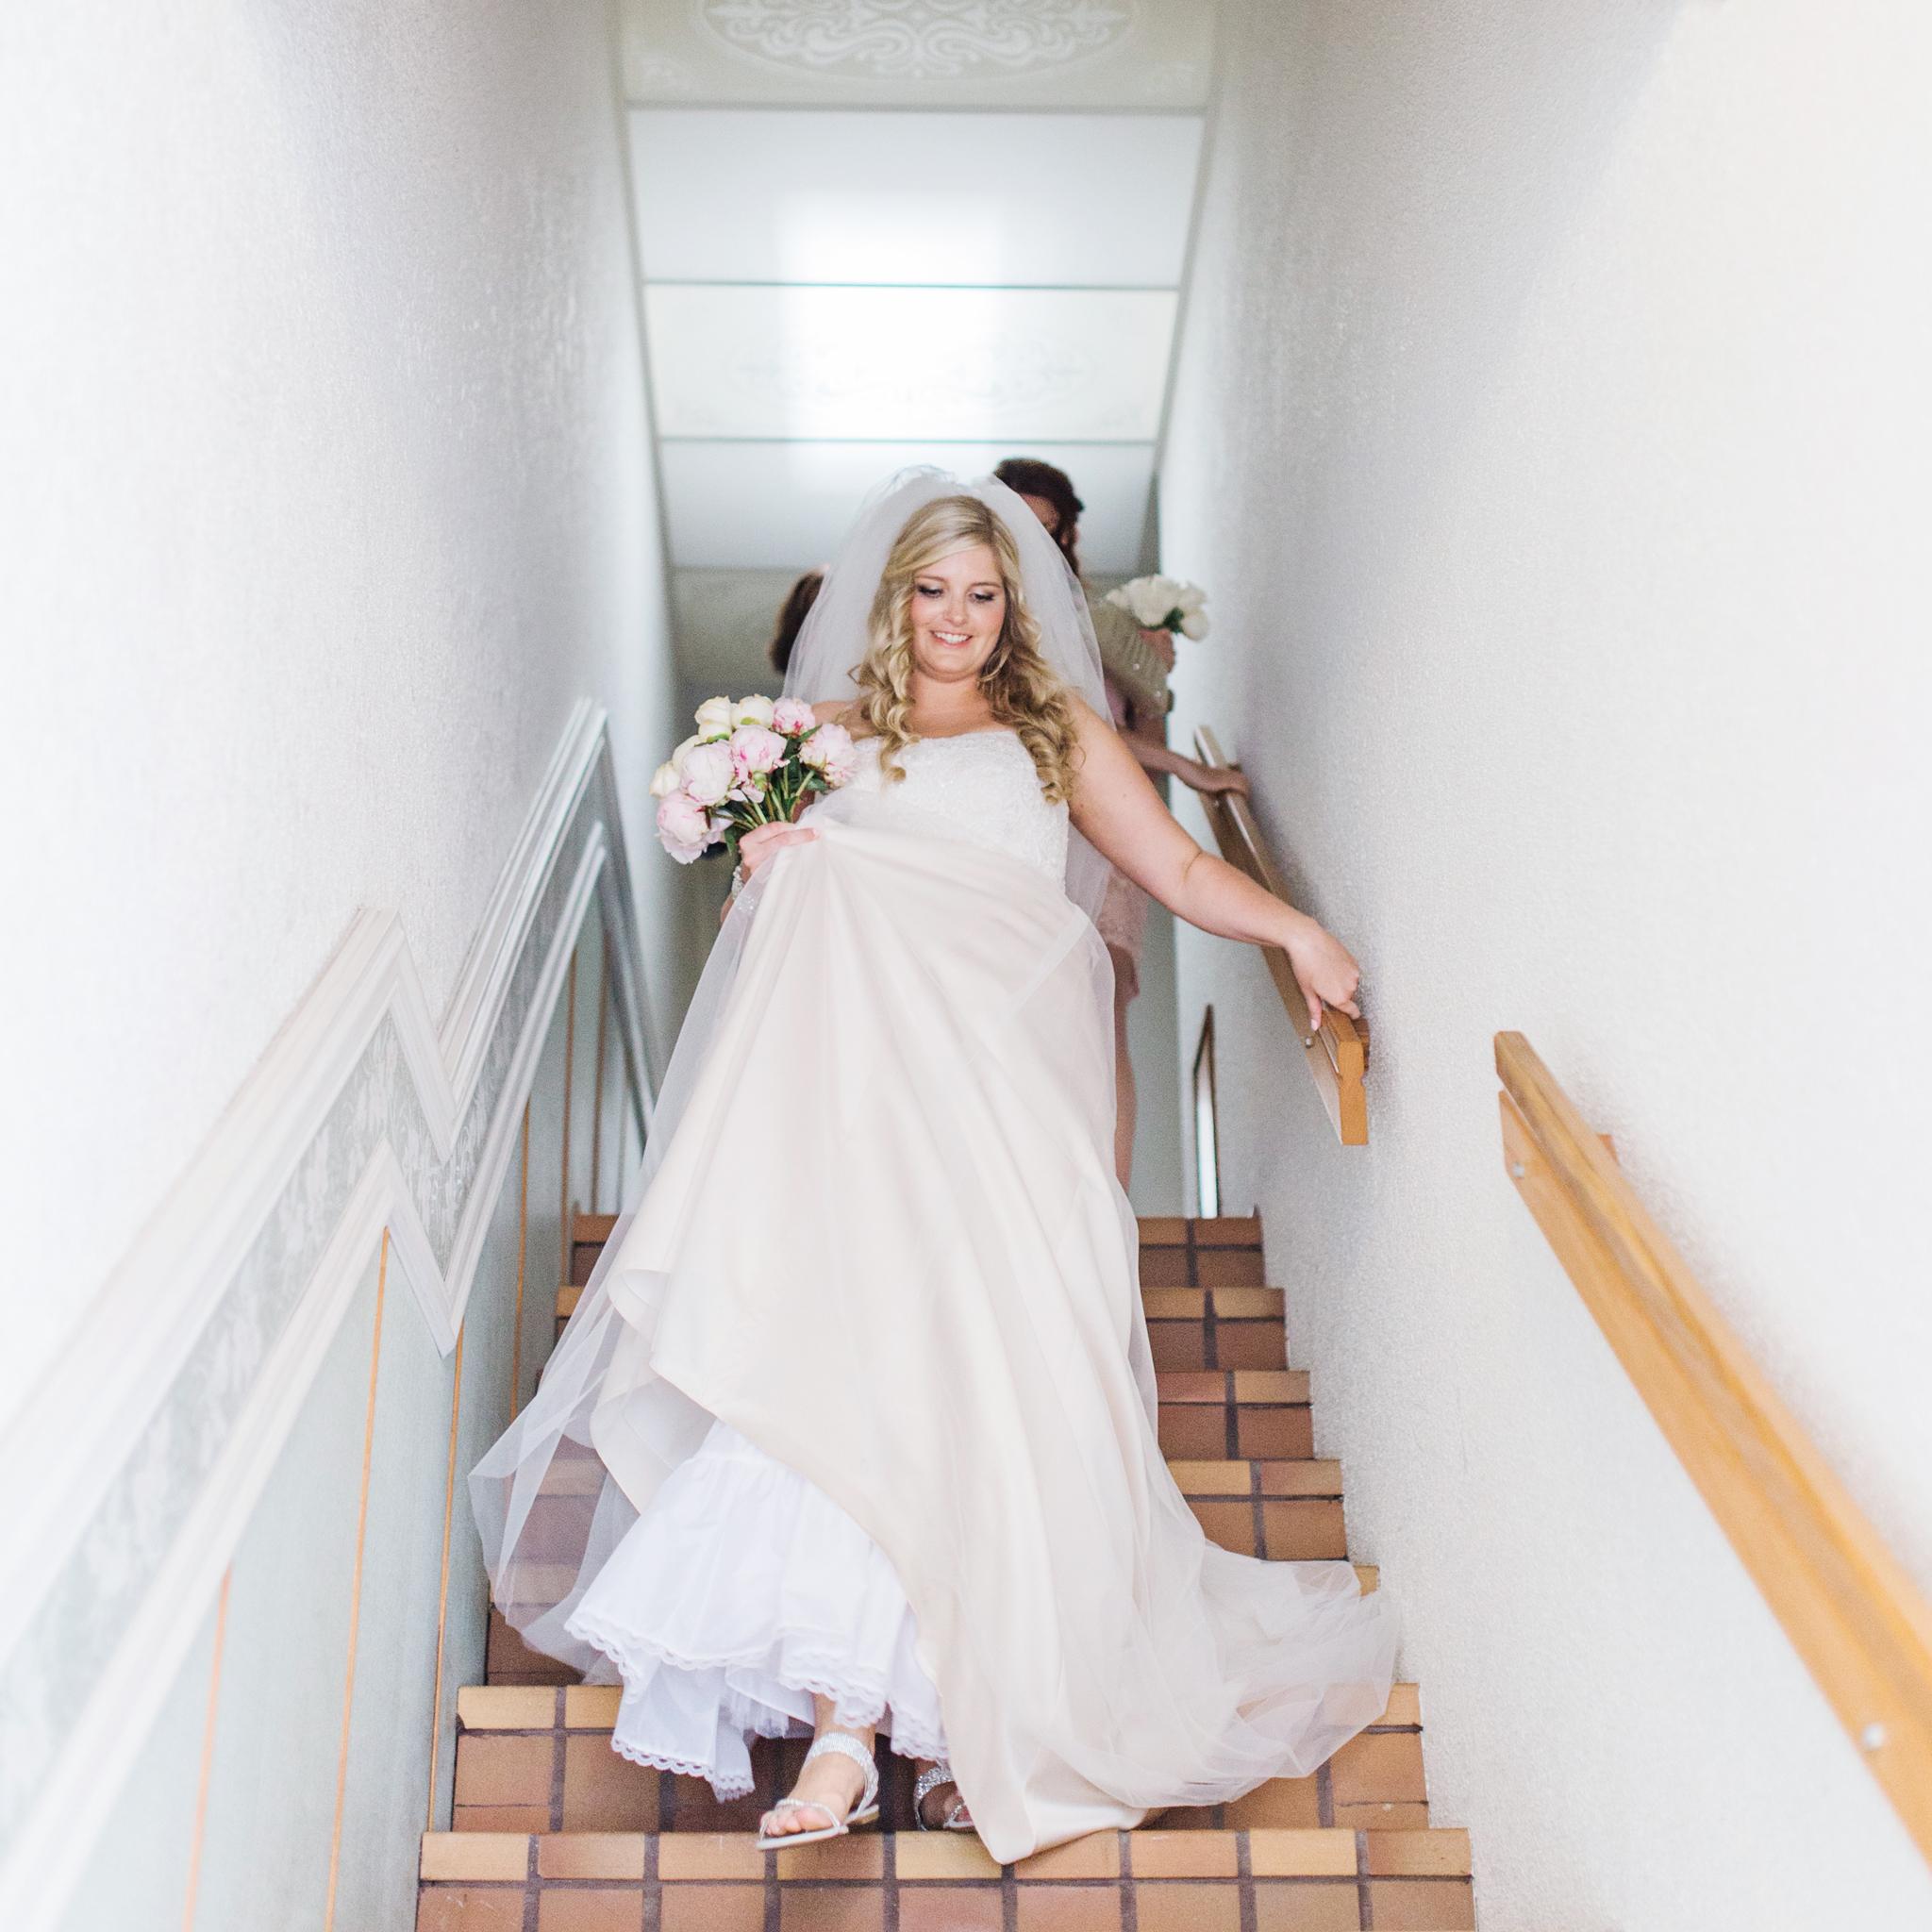 IMG_4726-VANCOUVER-WEDDING-PHOTOGRAPHER-JENNIFER-PICARD-PHOTOGRAPHY.jpg